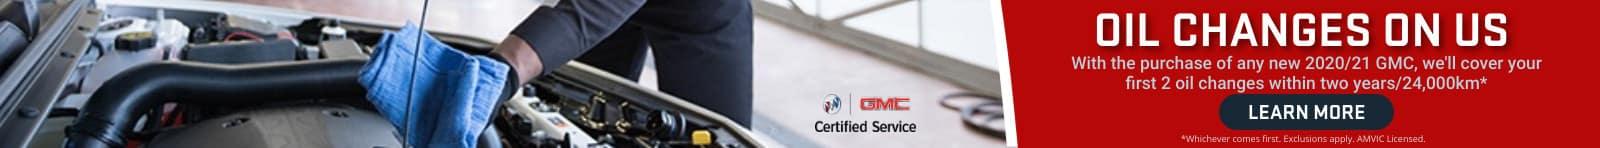 Certified Service – SBG-1600x148px-Customsize4-High-Quality